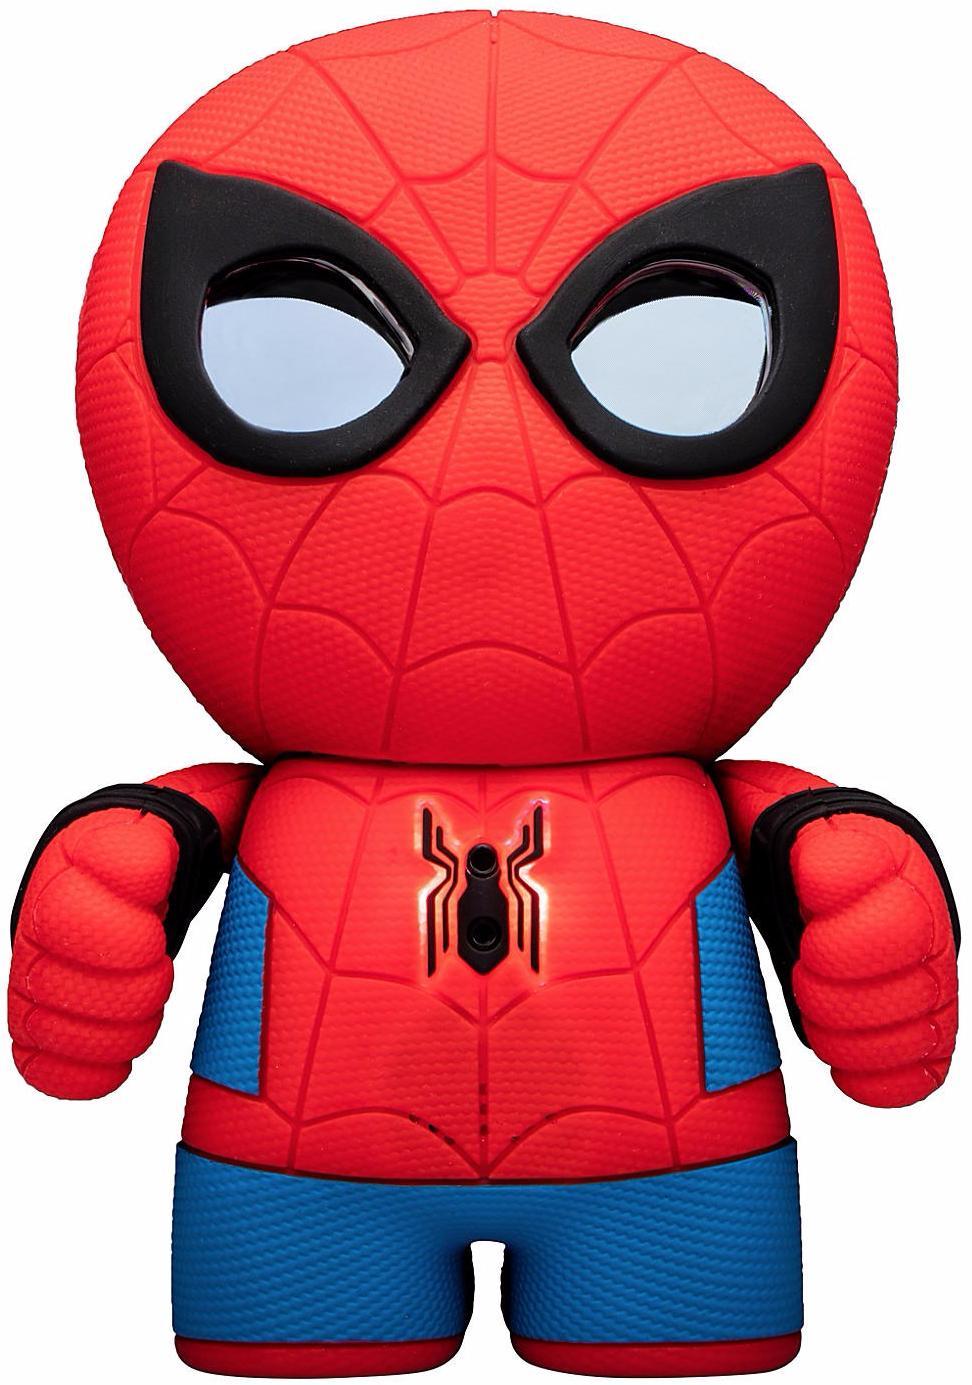 Sphero Spider Man (SP001ROW) - беспроводной робот (Red/Blue)